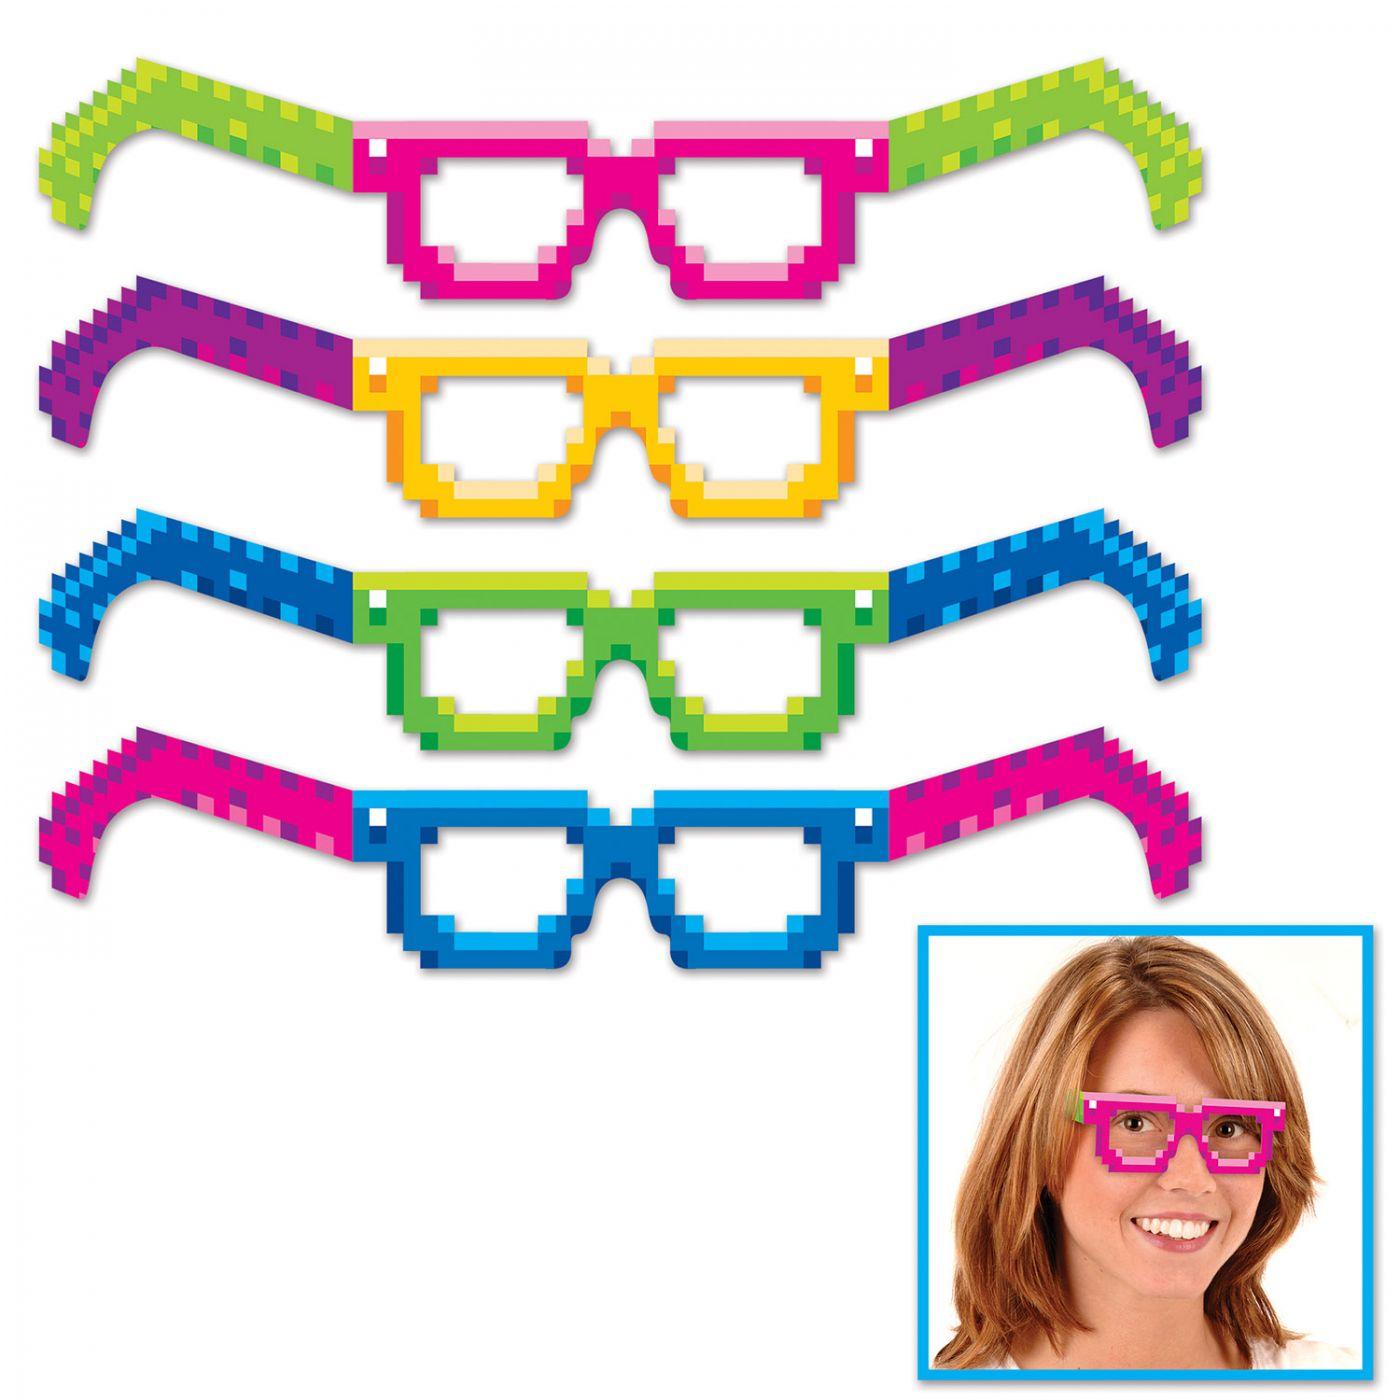 8-Bit Eyeglasses image